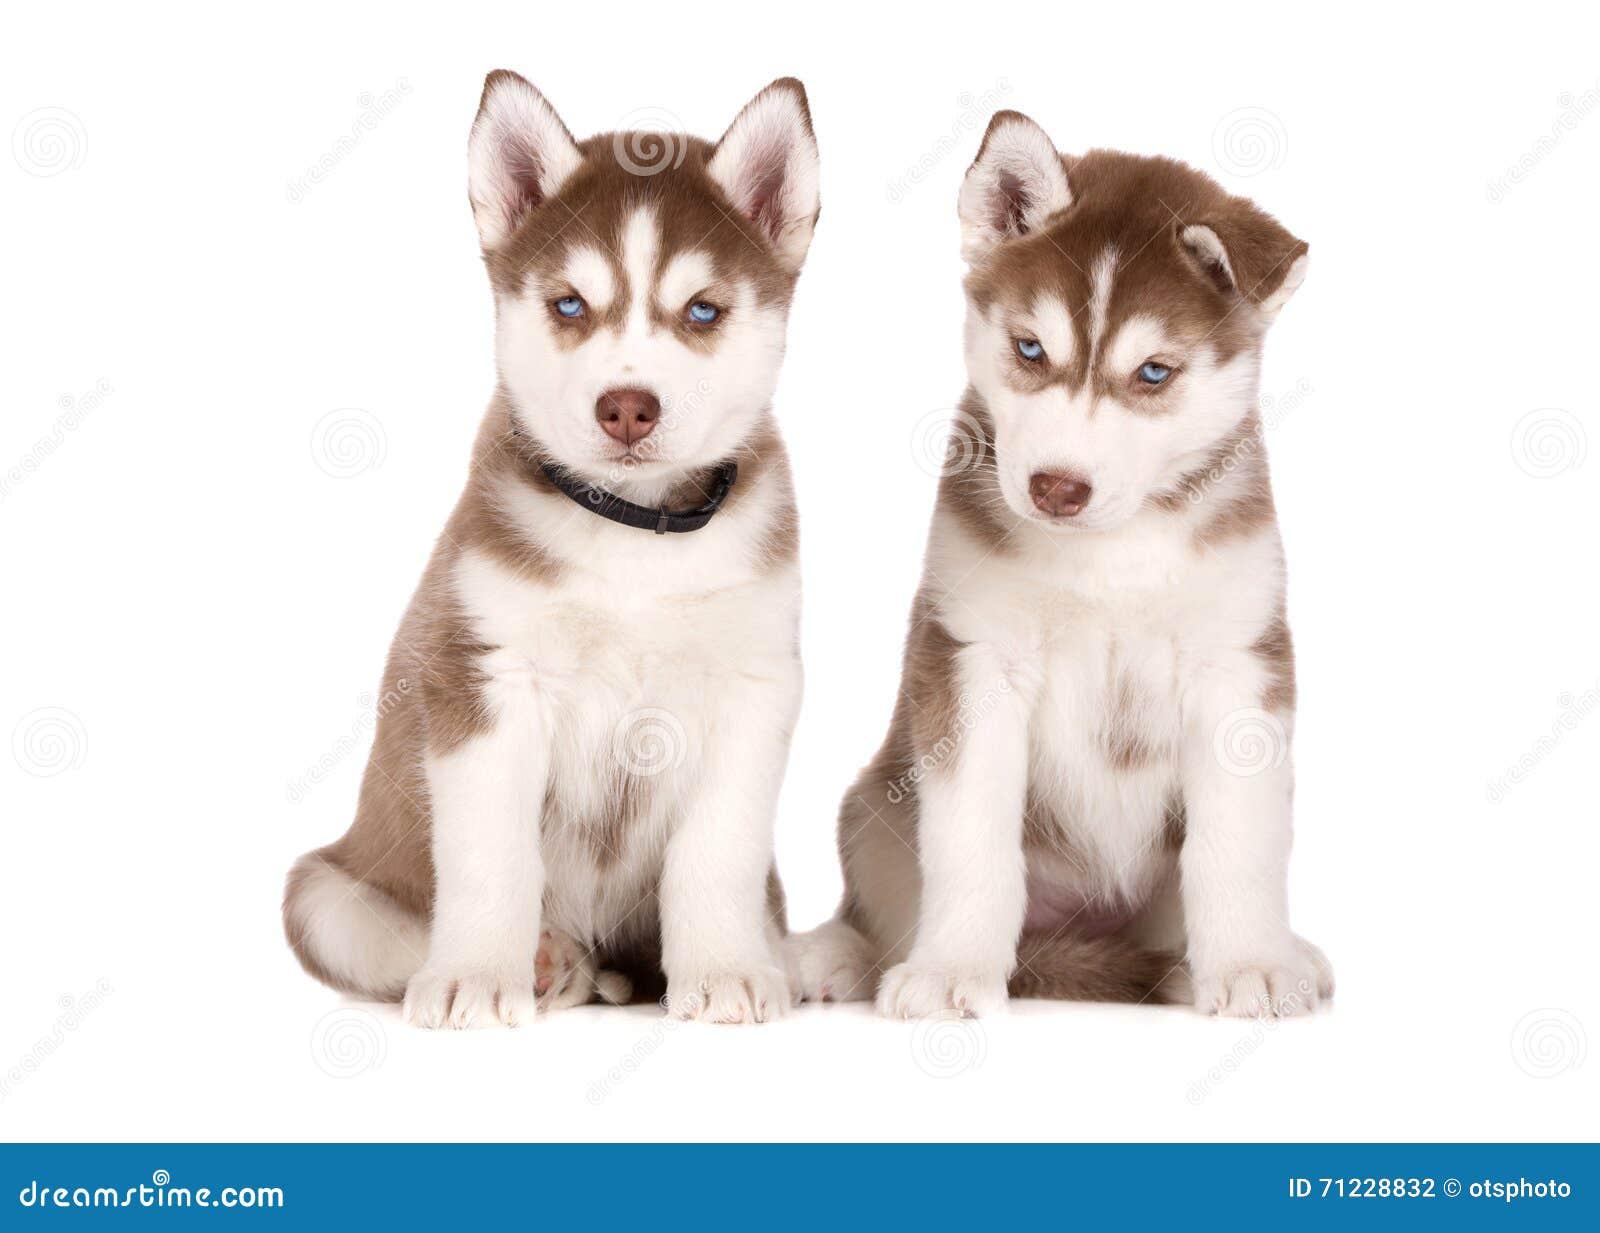 Siberian Husky Puppies Posing On White Stock Photo Image Of Isolated Studio 71228832